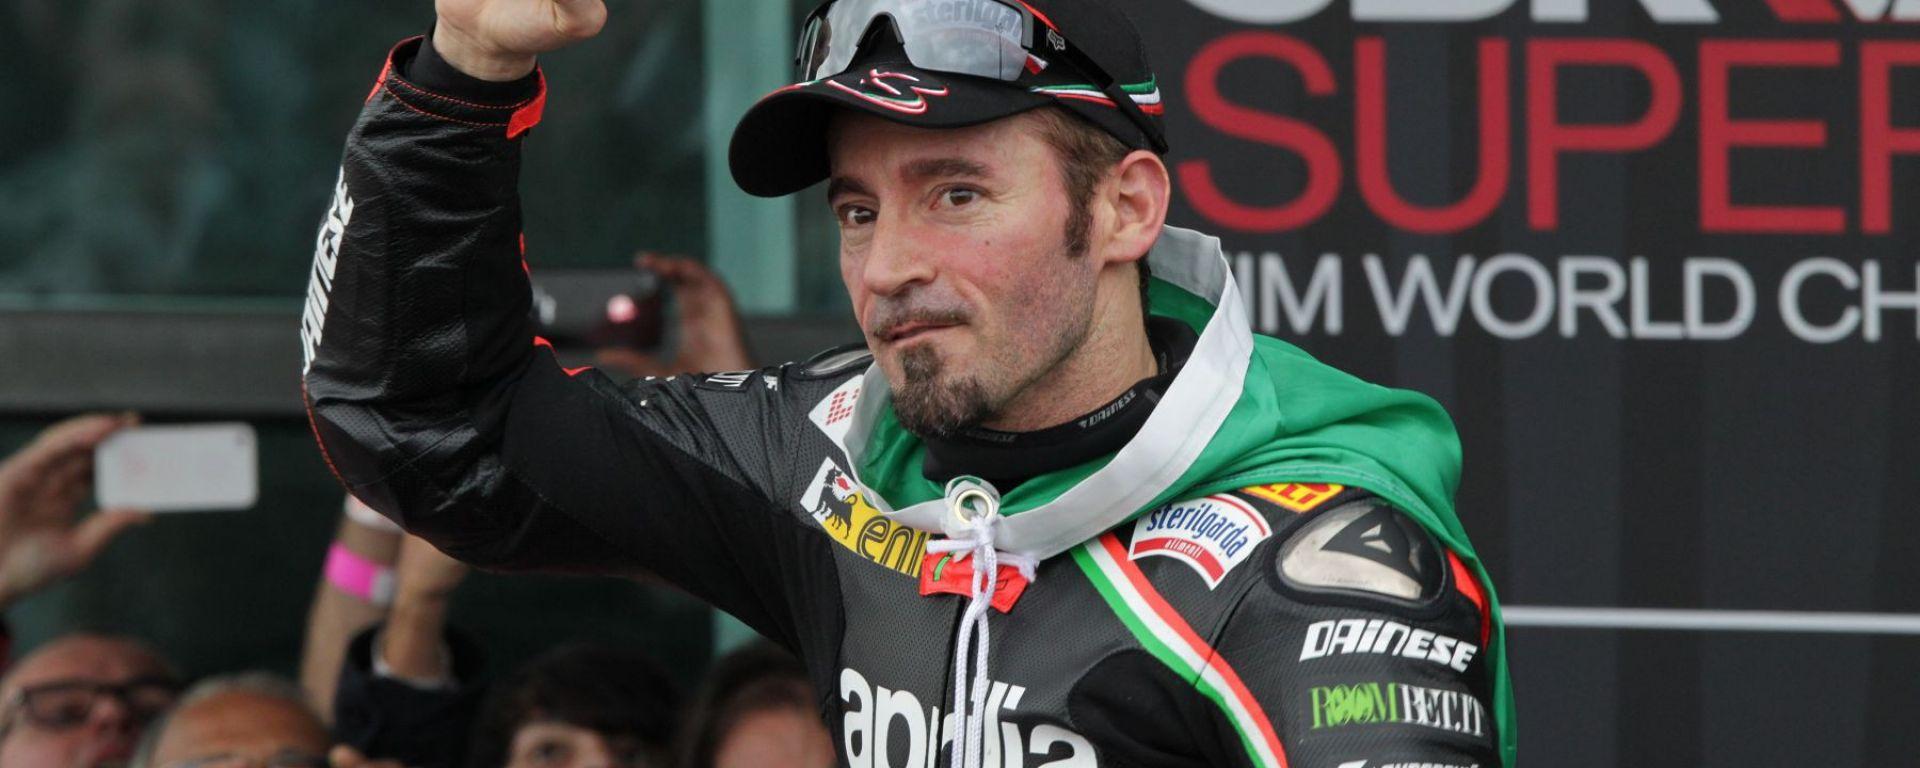 Max Biaggi commentatore Superbike 2013